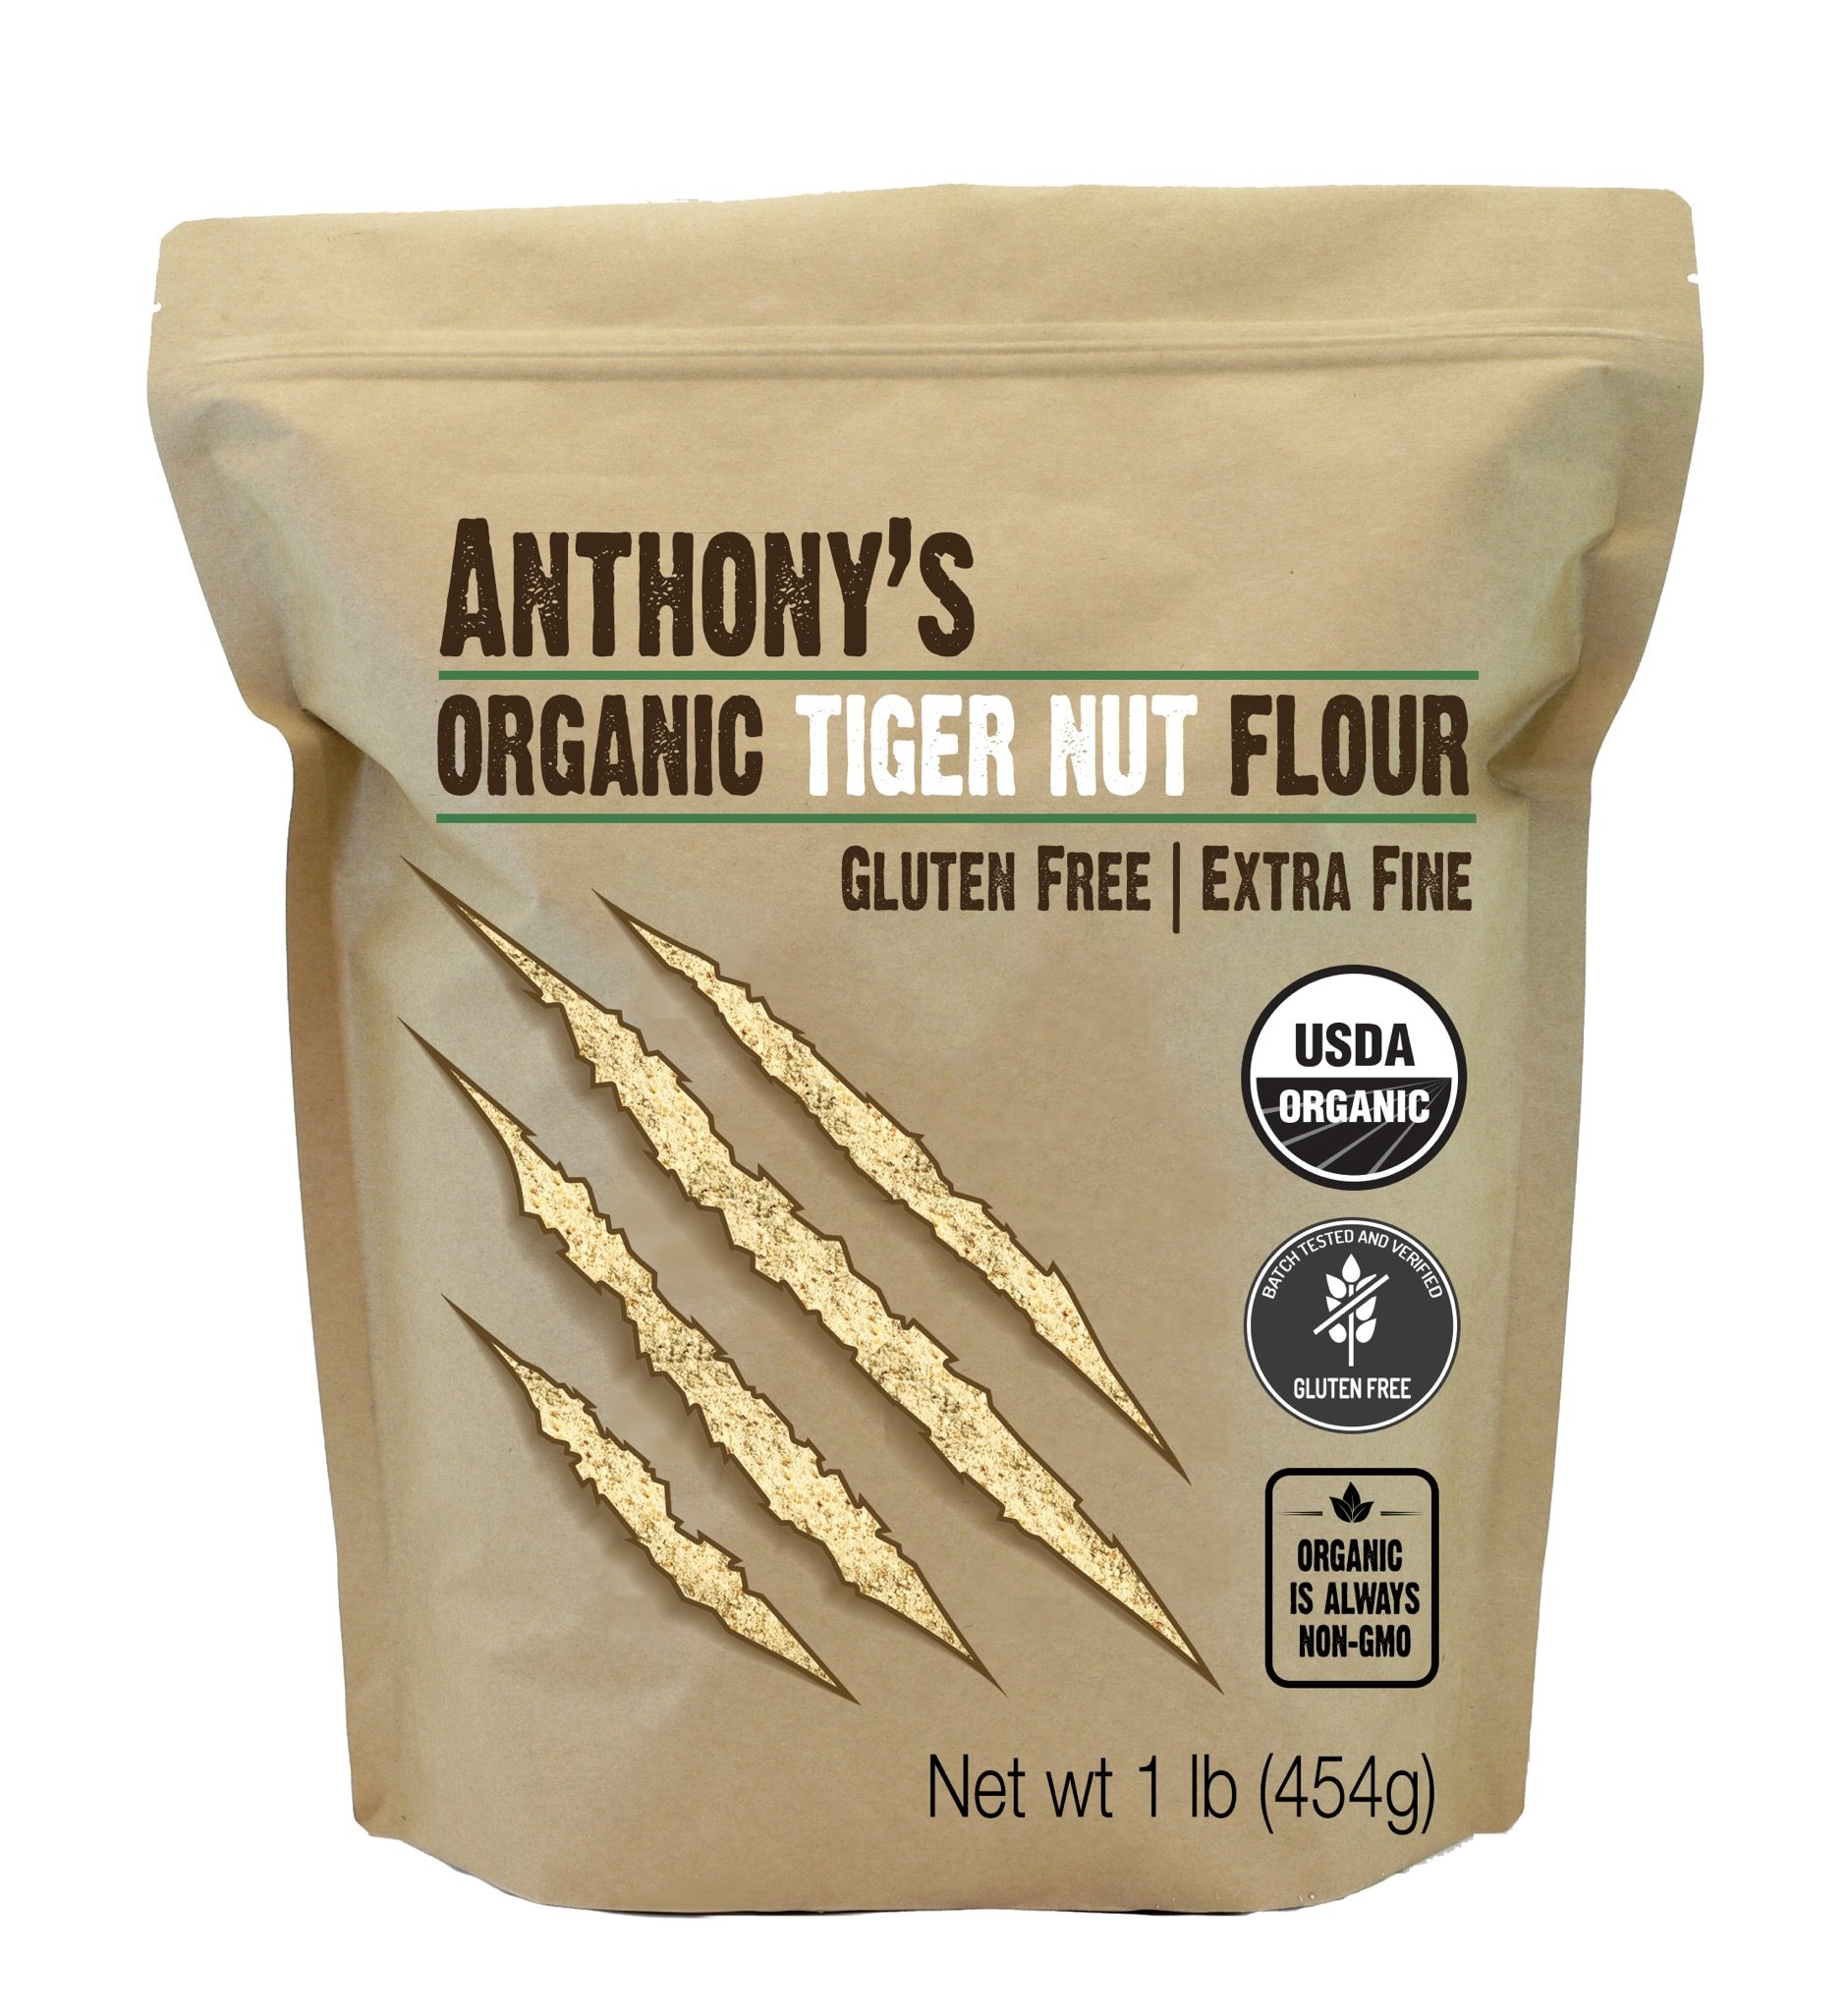 Anthony's Organic Tiger Nut Flour (1lb), Gluten Free, Non-GMO